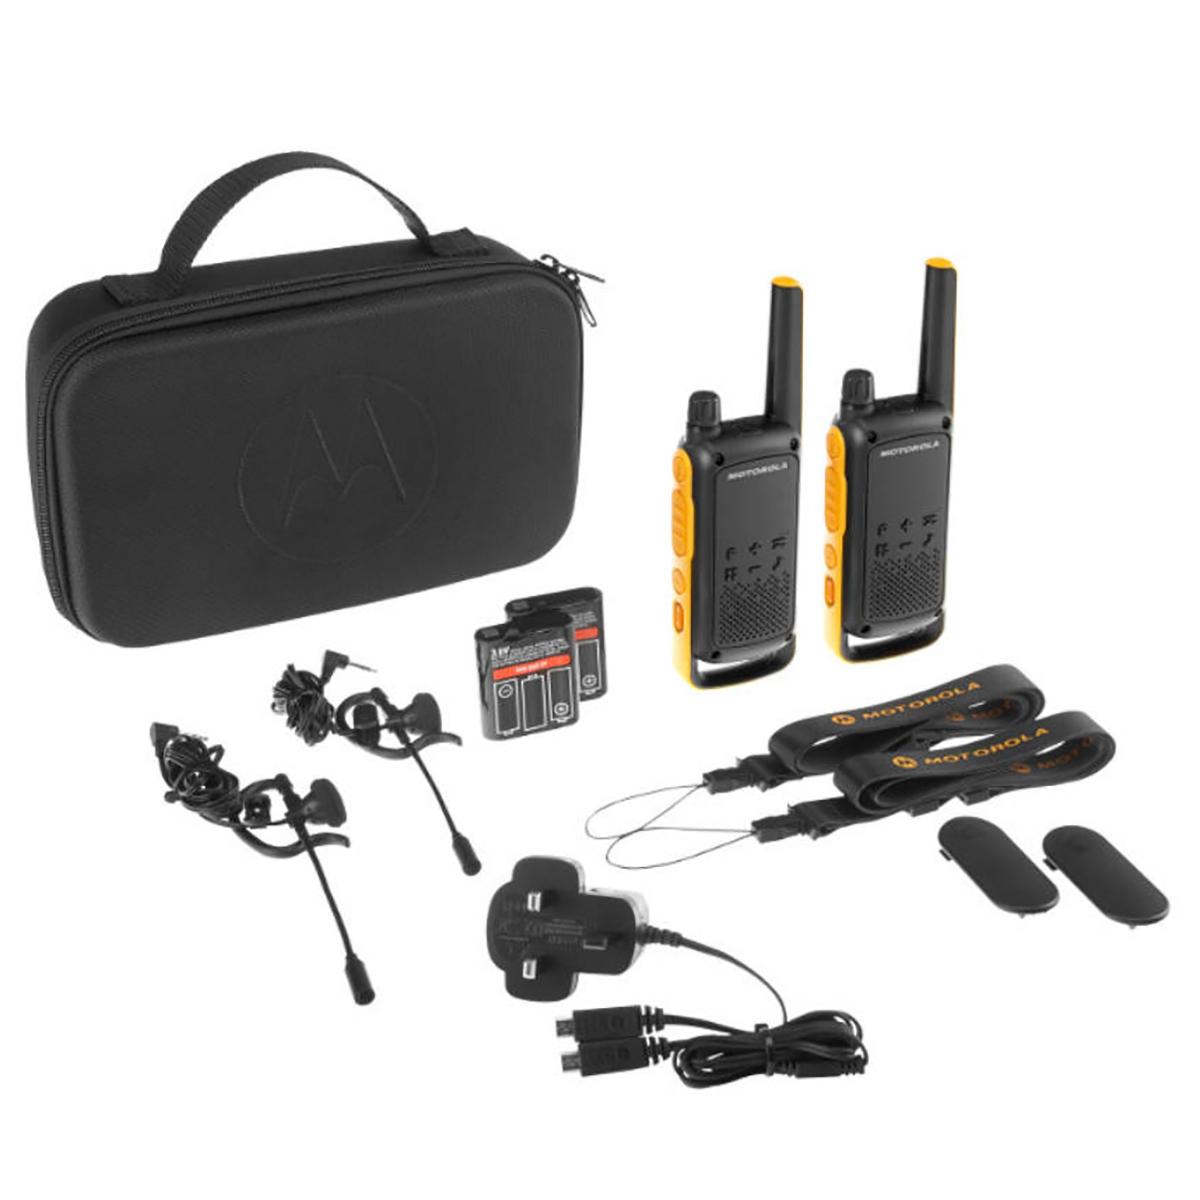 Motorola TLKR T82 Extreme Walkie Talkie TWIN Pack